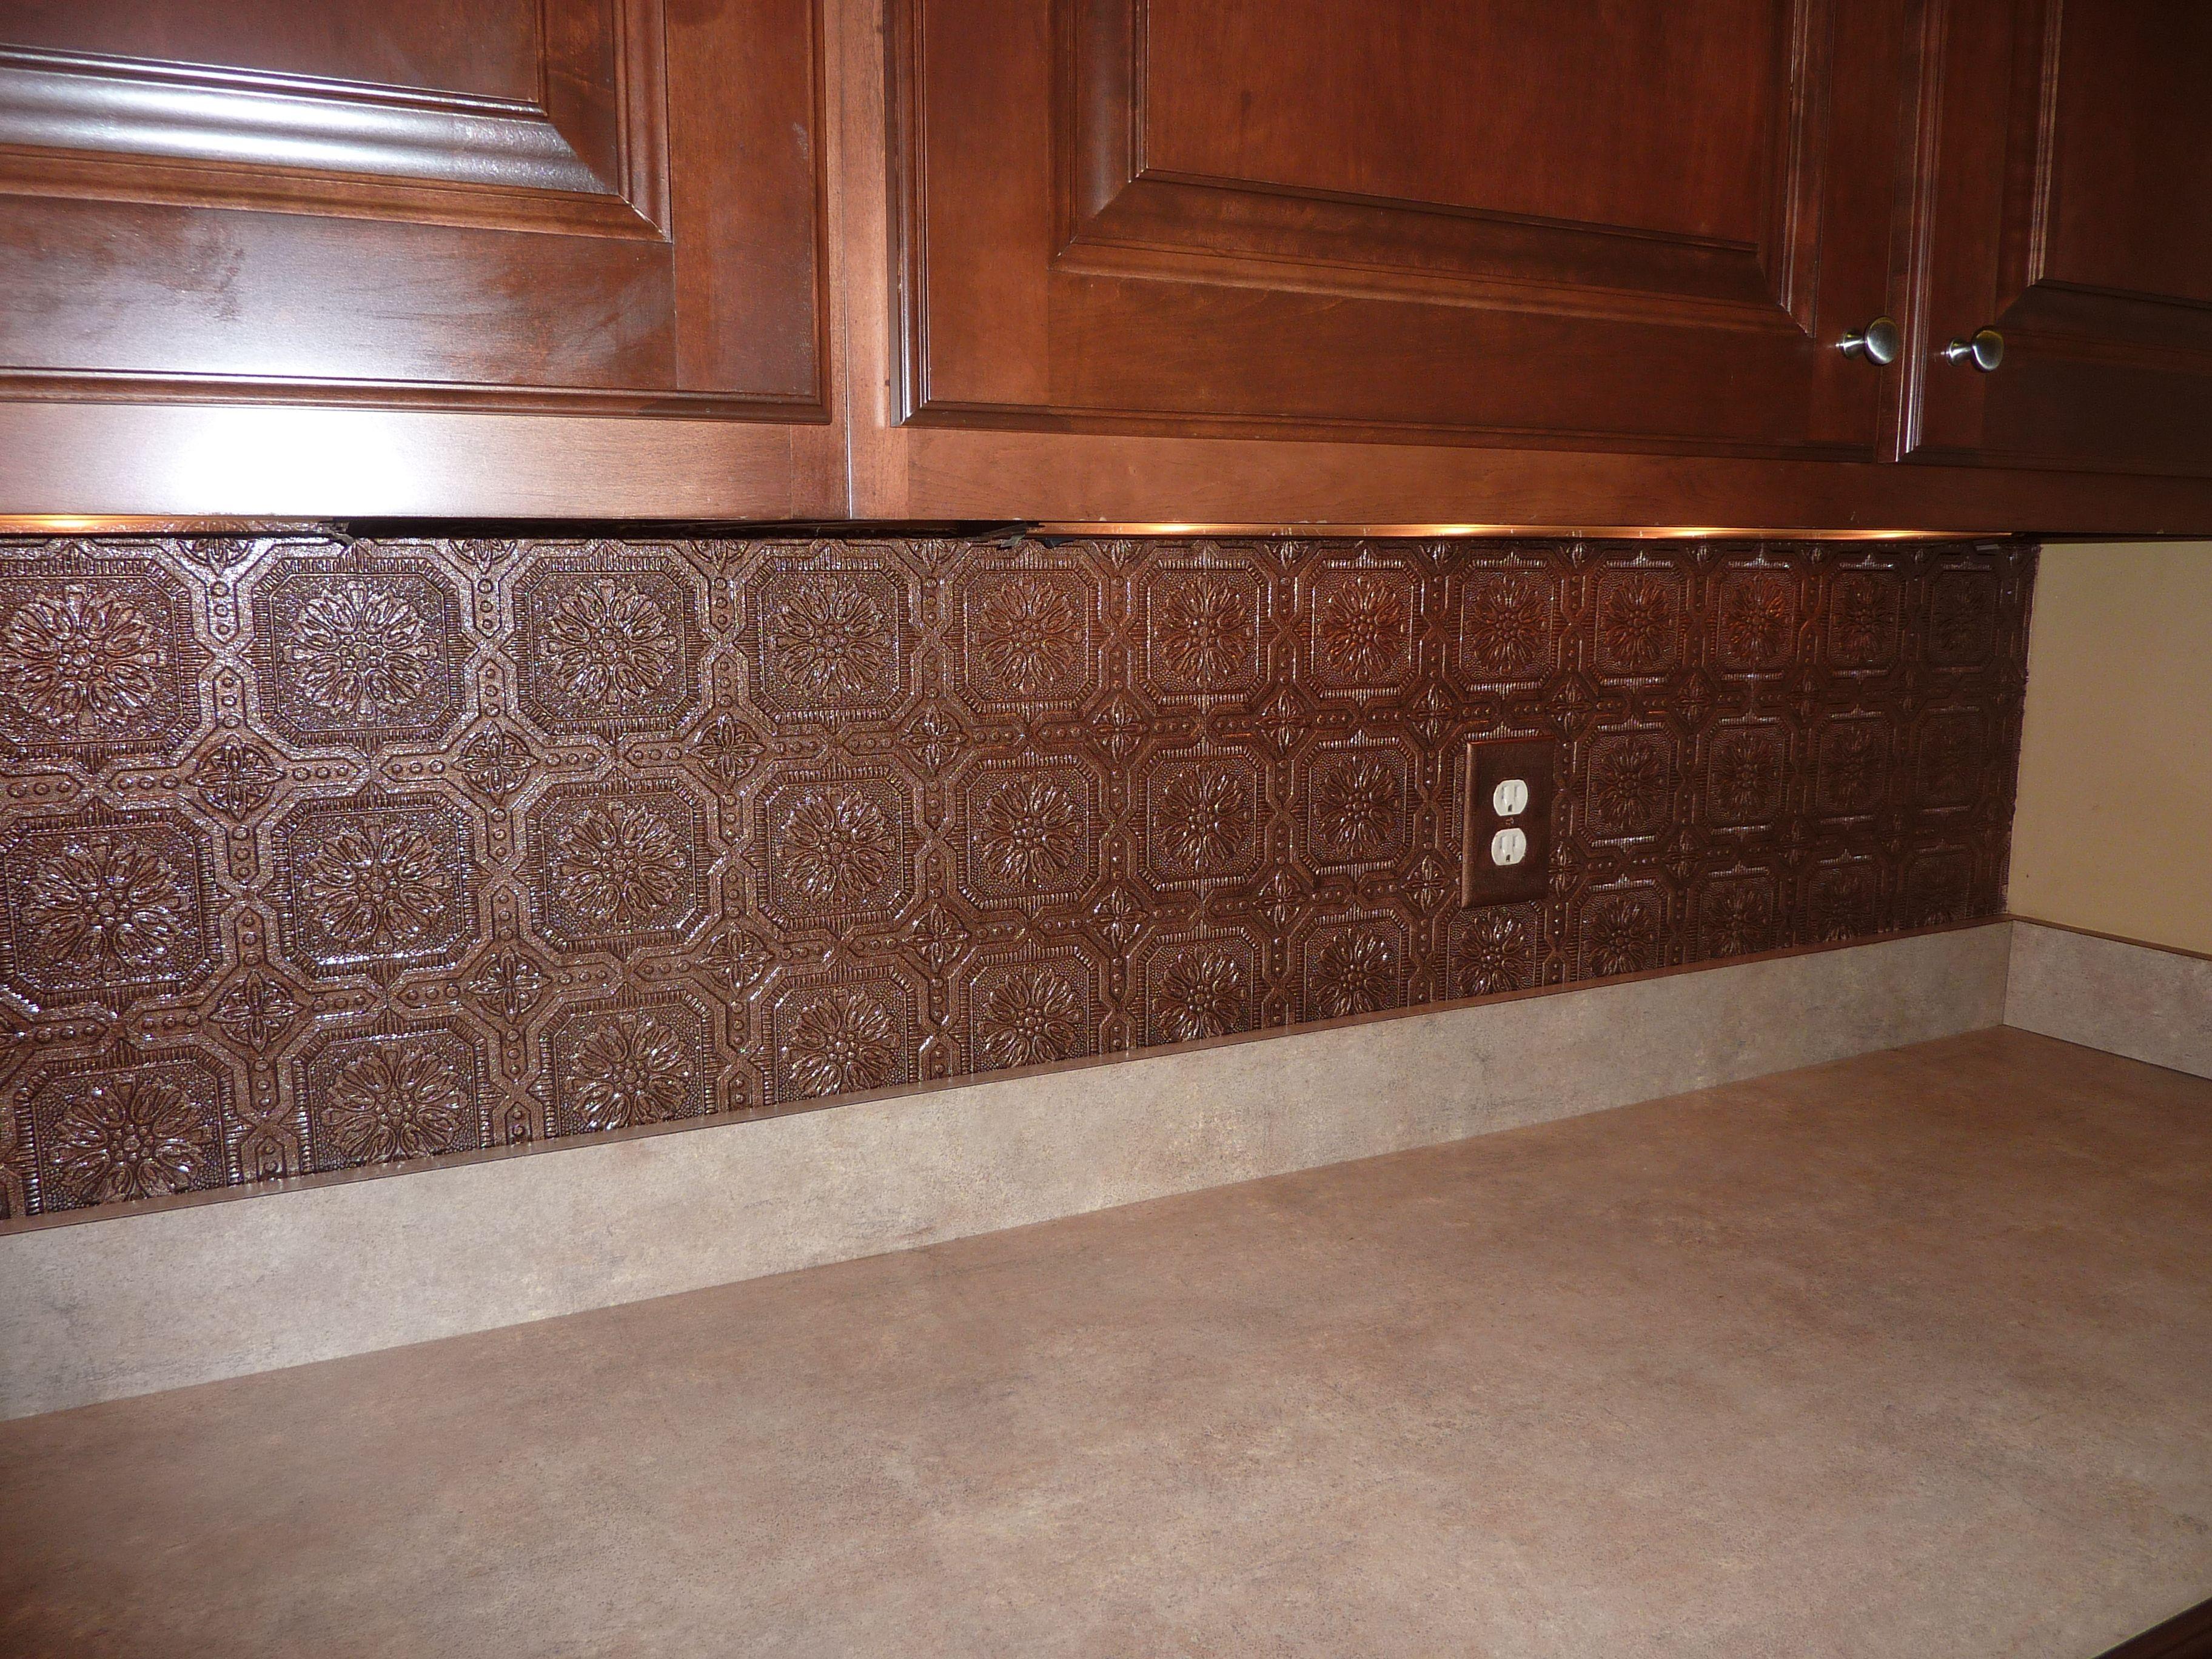 vinyl wallpaper kitchen backsplash farmhouse lighting textured painted with aged copper